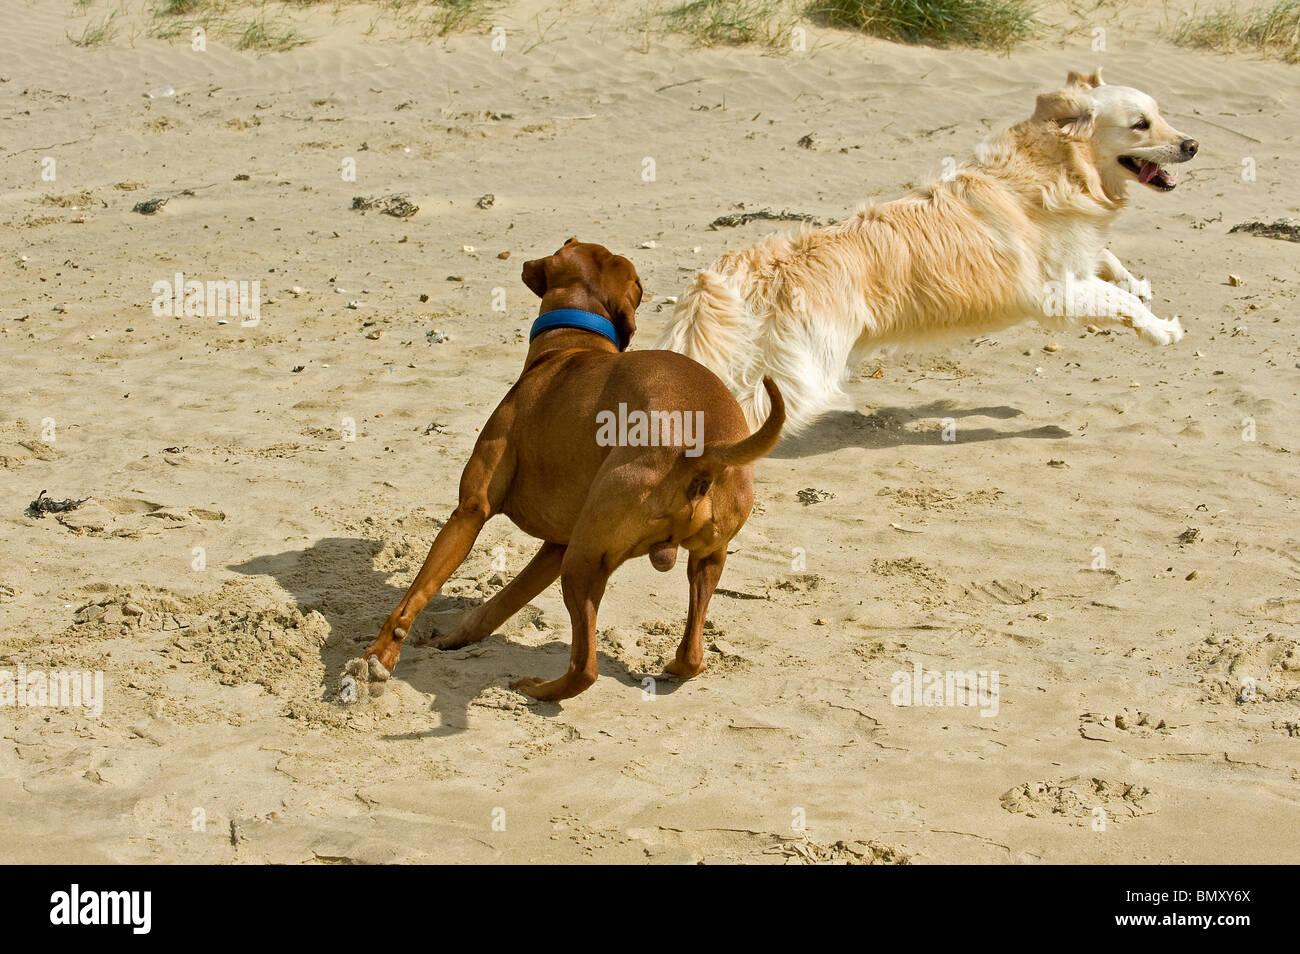 Magyar Vizsl dog Golden Retriever dog the beach - Stock Image